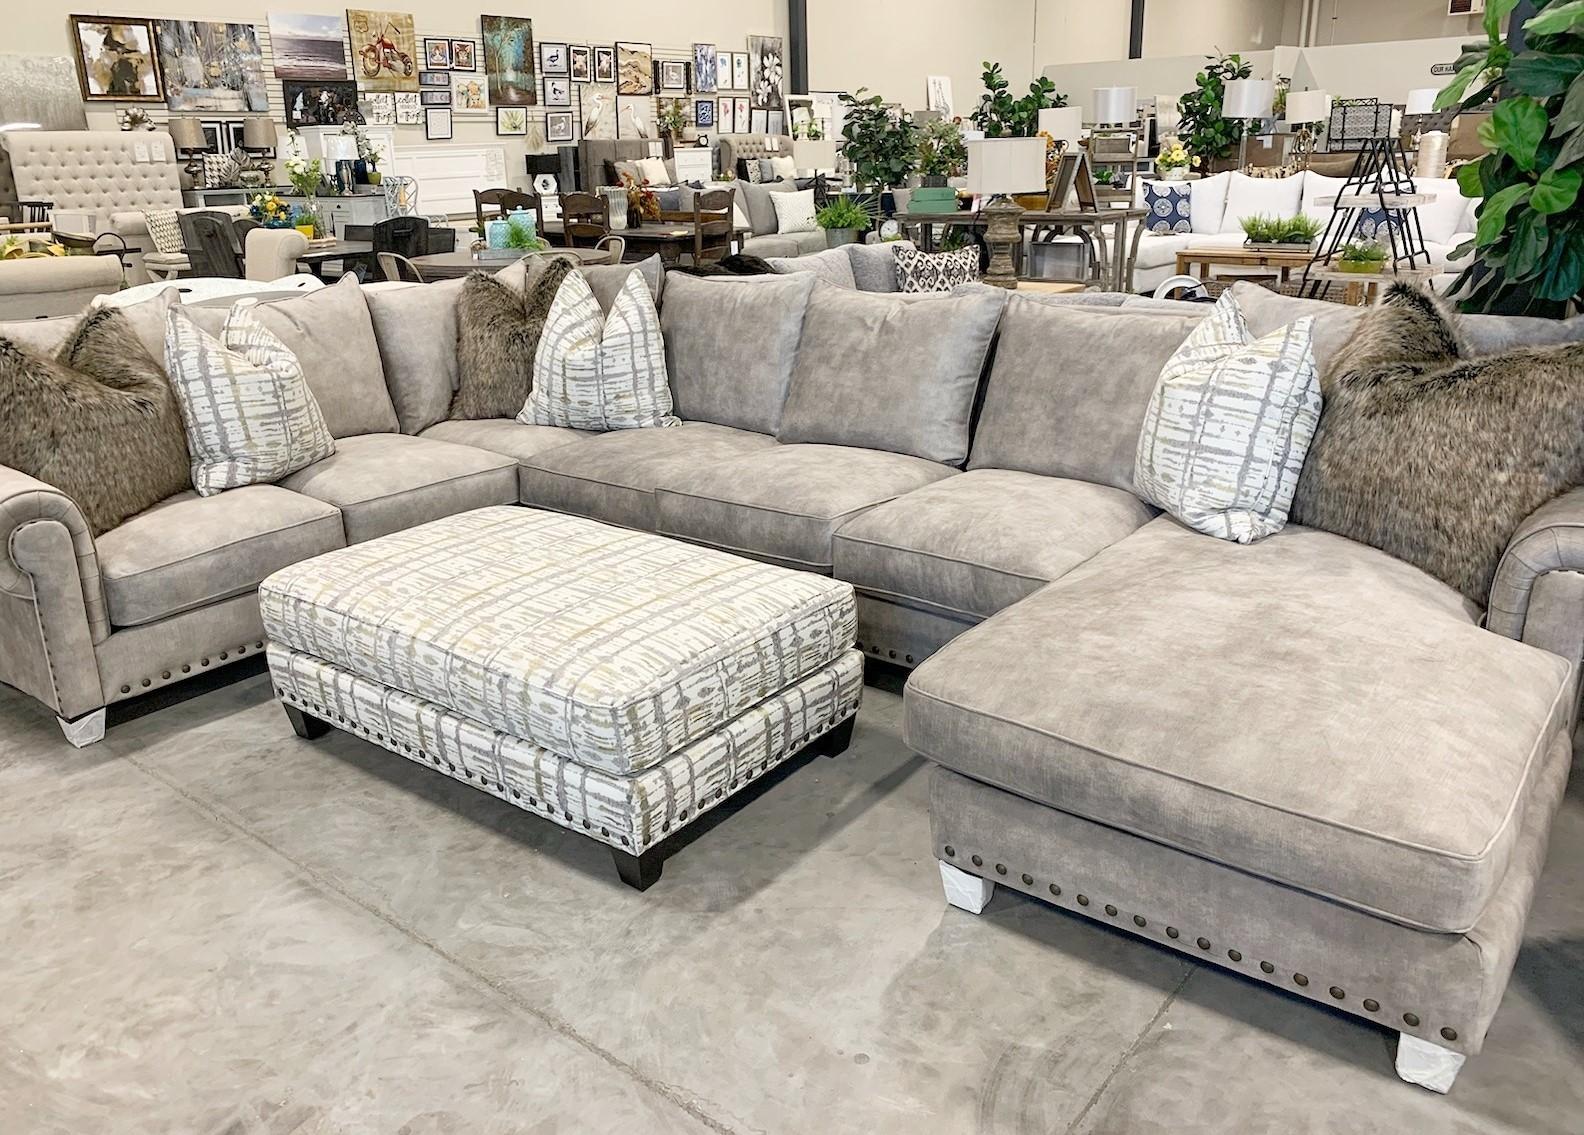 Miraculous Furniture Couches Sectionals Sofas John Michael Designs Llc Evergreenethics Interior Chair Design Evergreenethicsorg